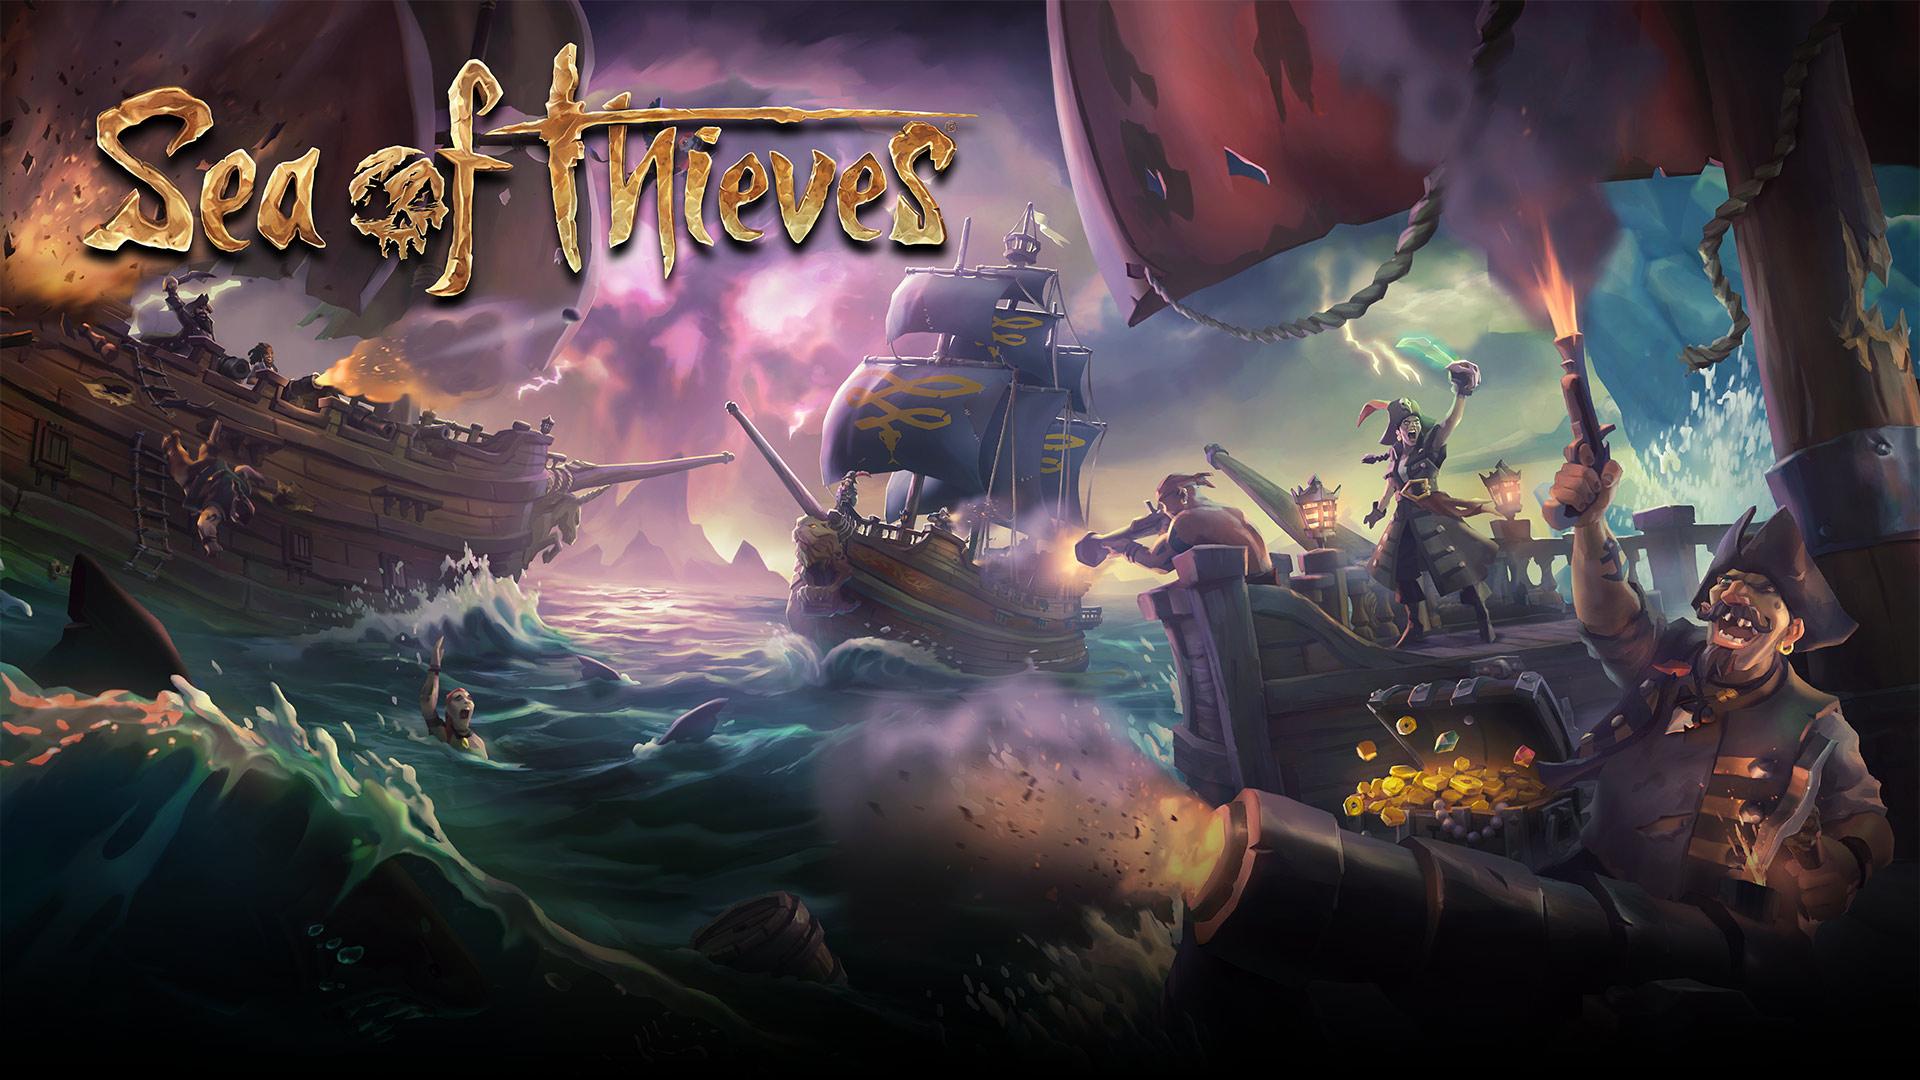 Le 20 mars 2018 — Sea of Thieves